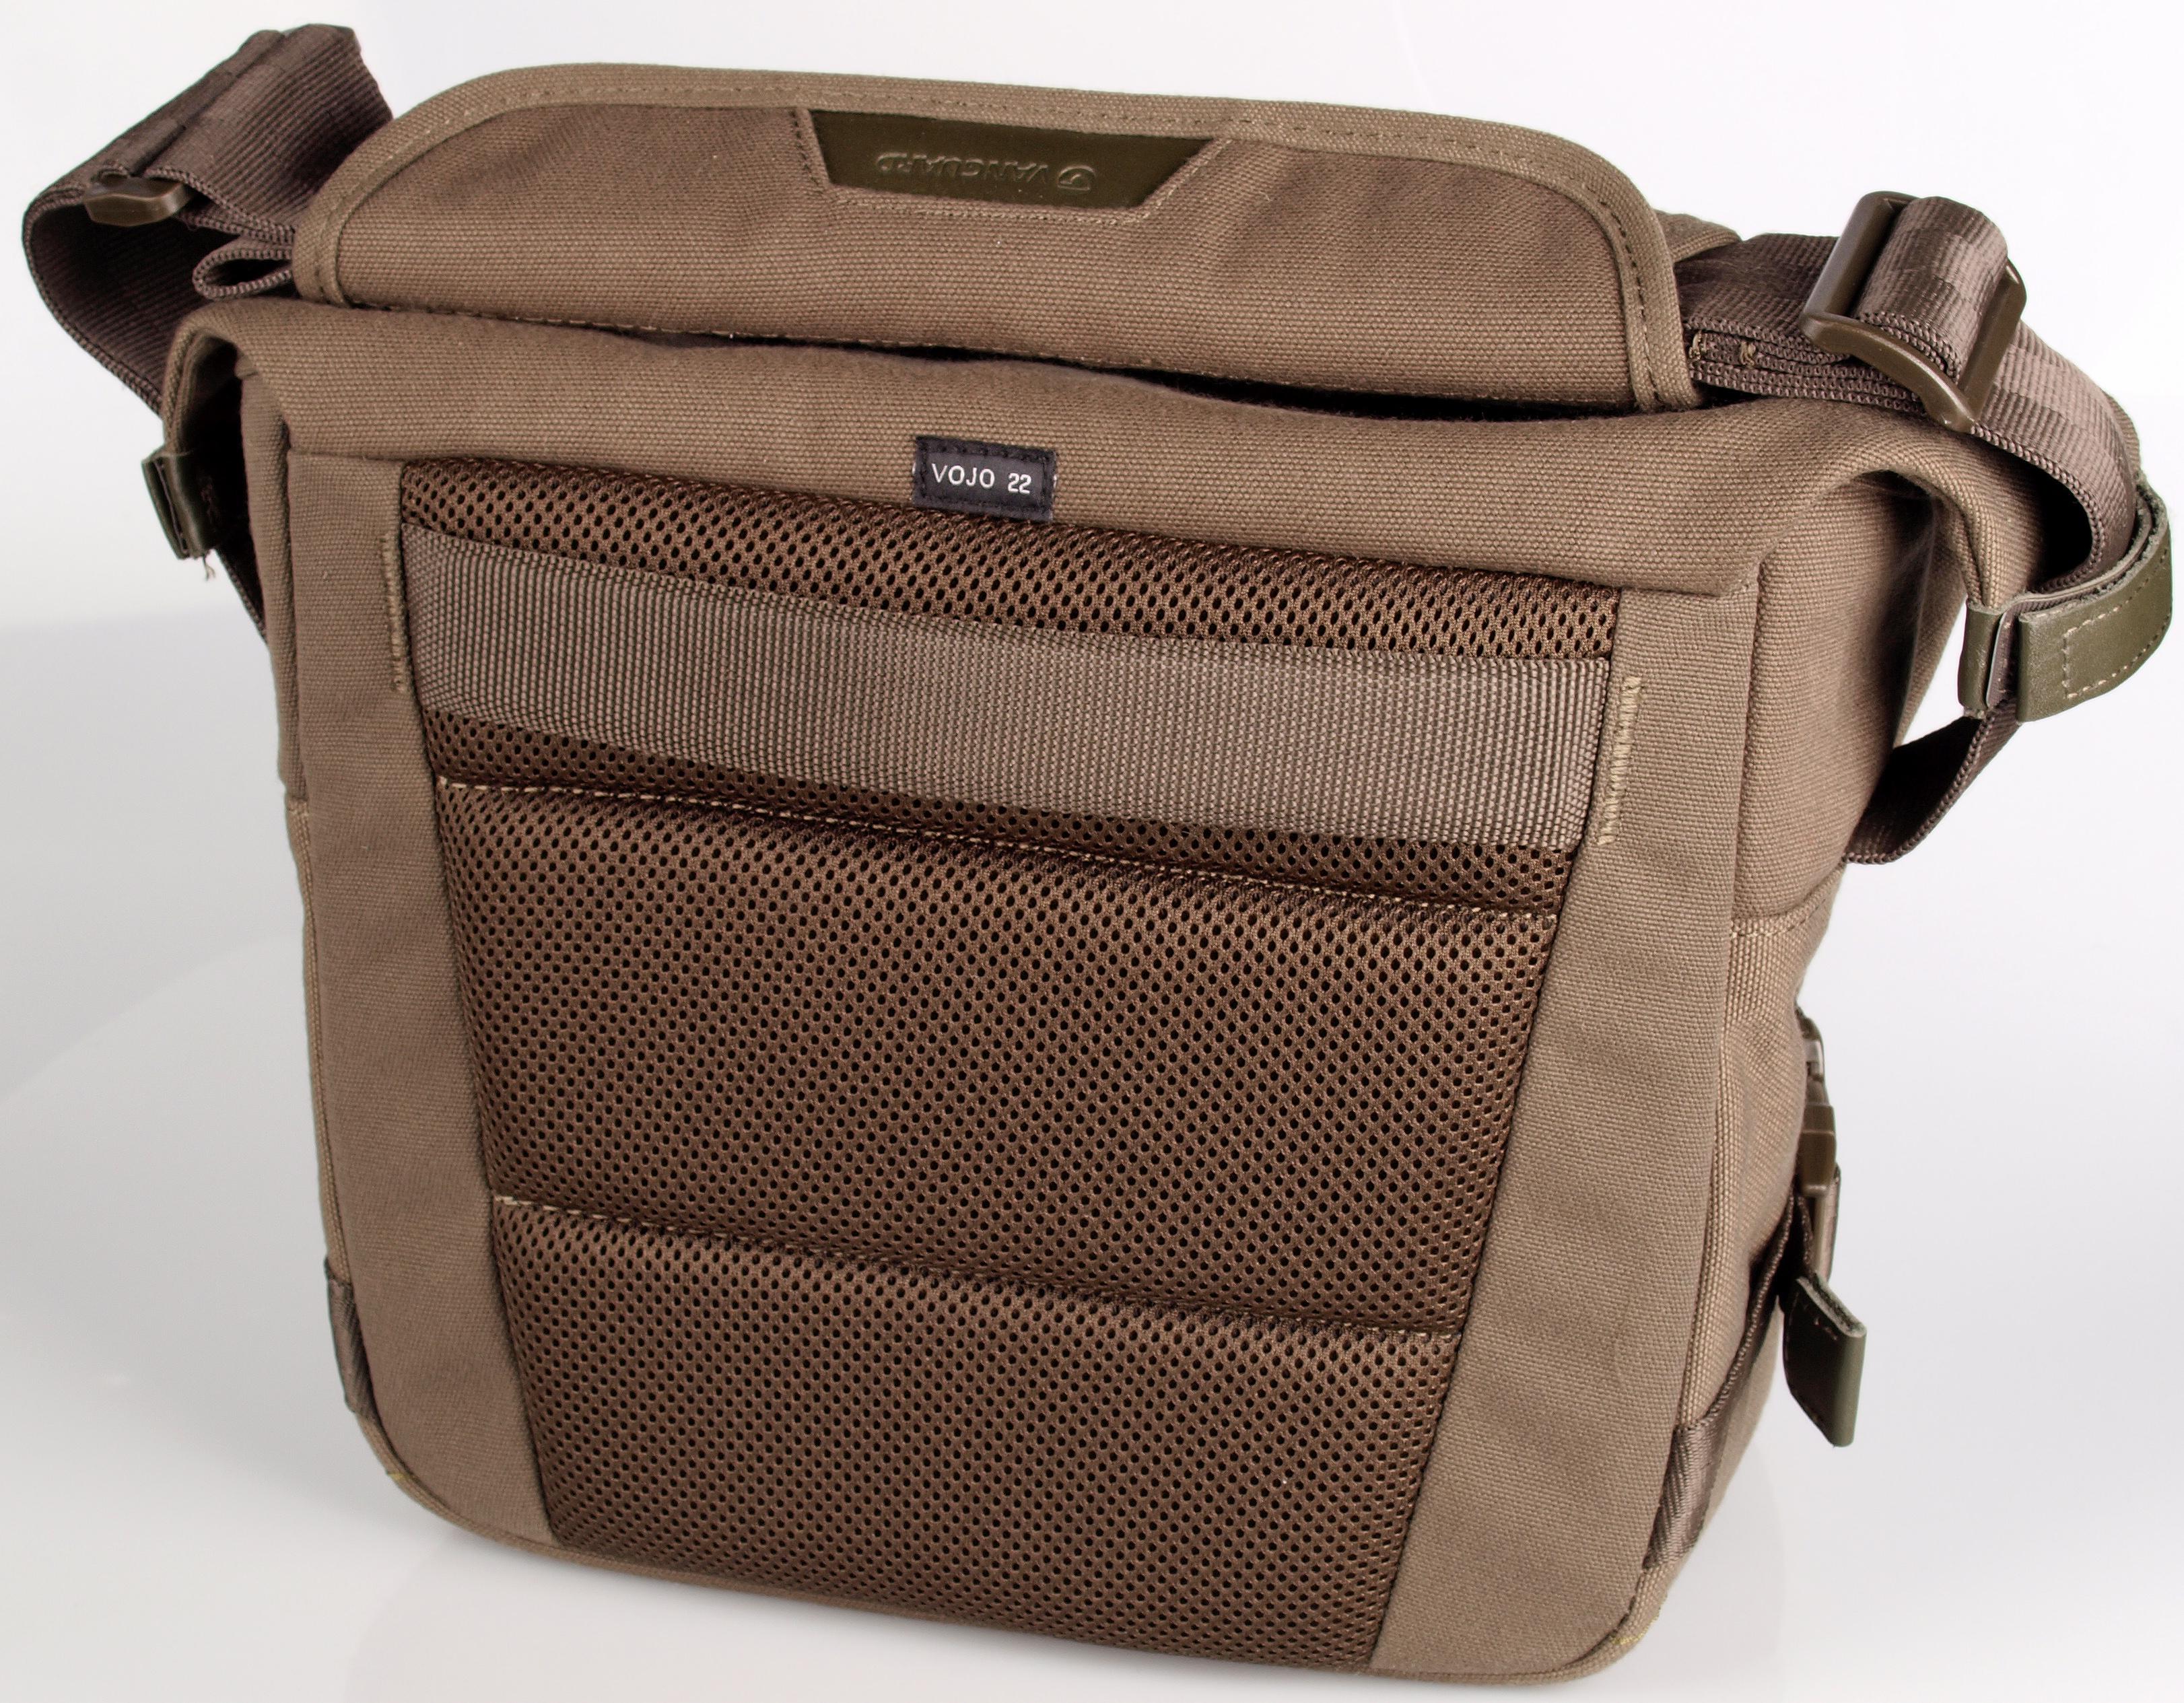 Vanguard Vojo 22 Bag Review 13 3